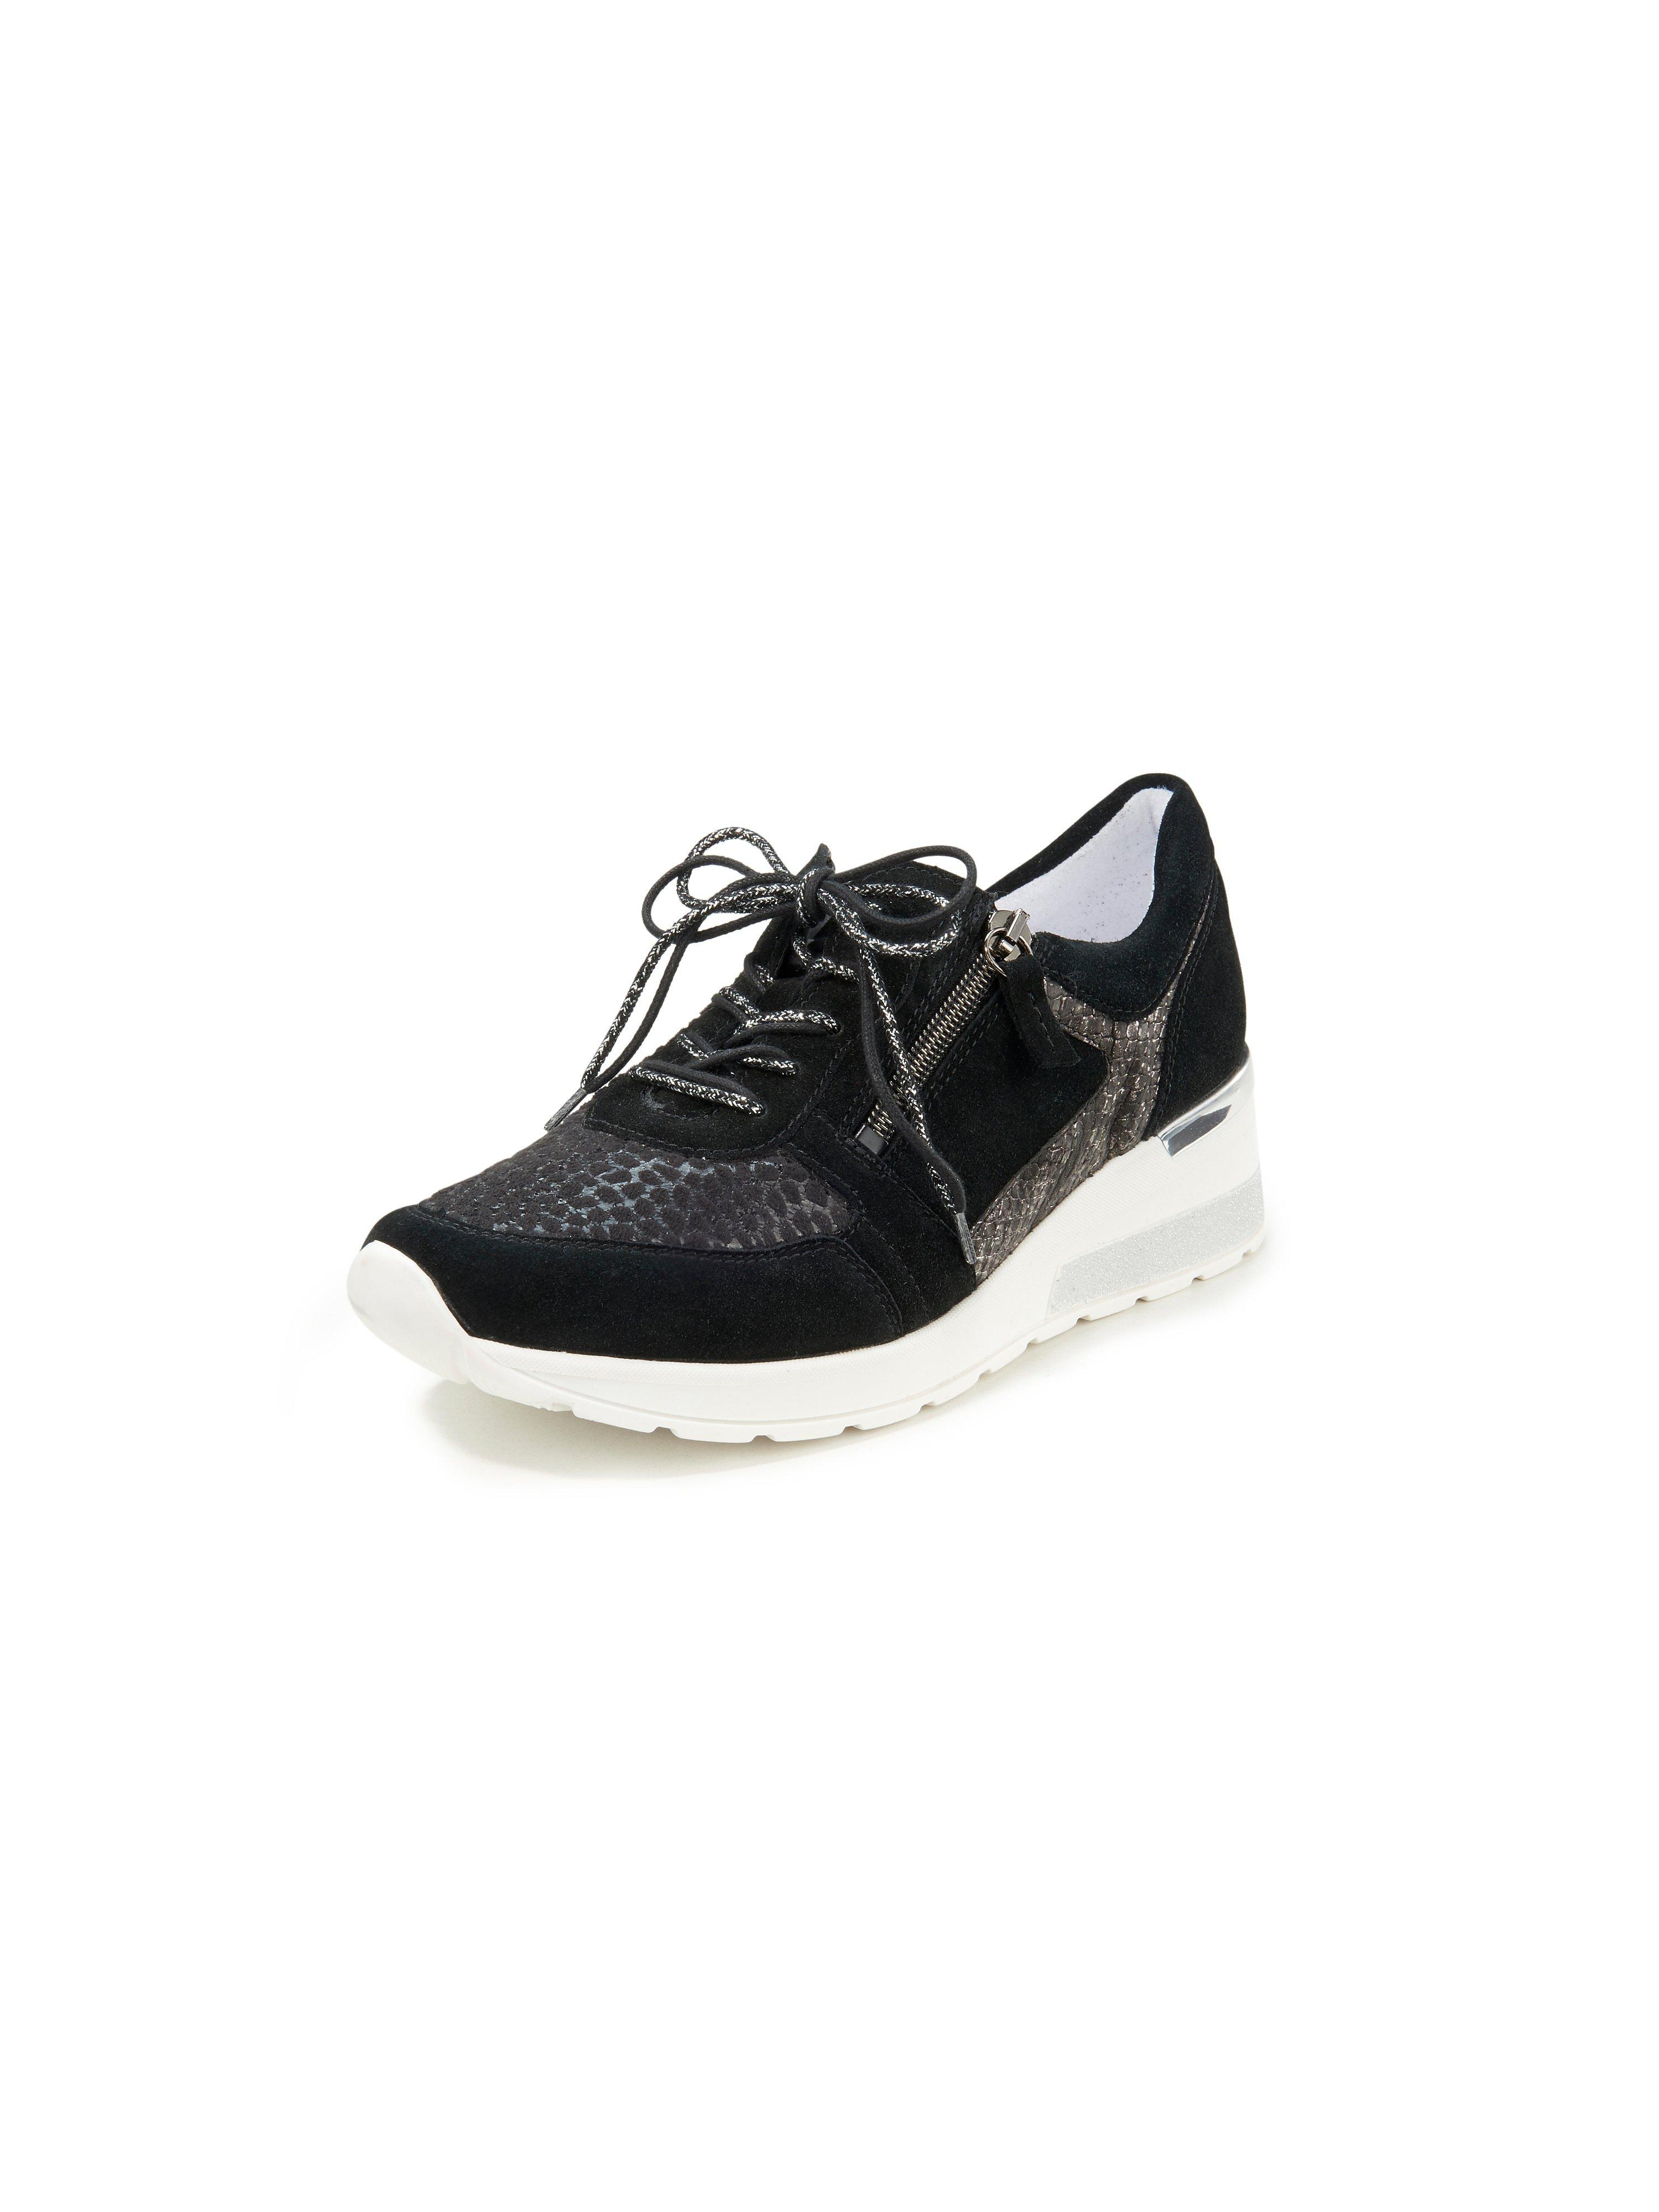 Sneakers Clara Waldläufer Orthotritt black